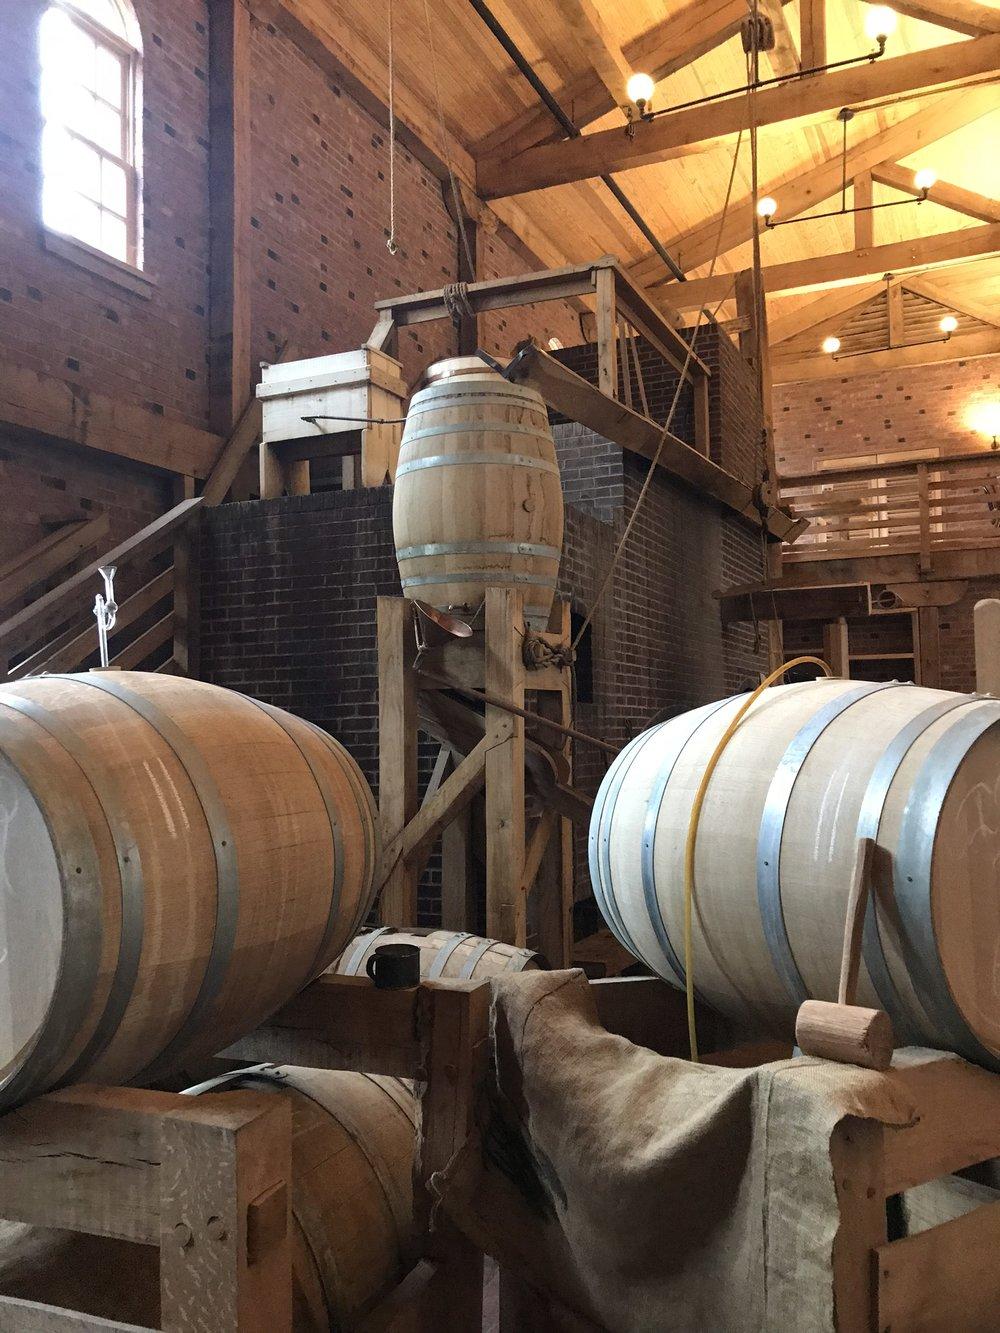 The Historic Carillon Brewing Company at Dayton History and Carrillon Park.